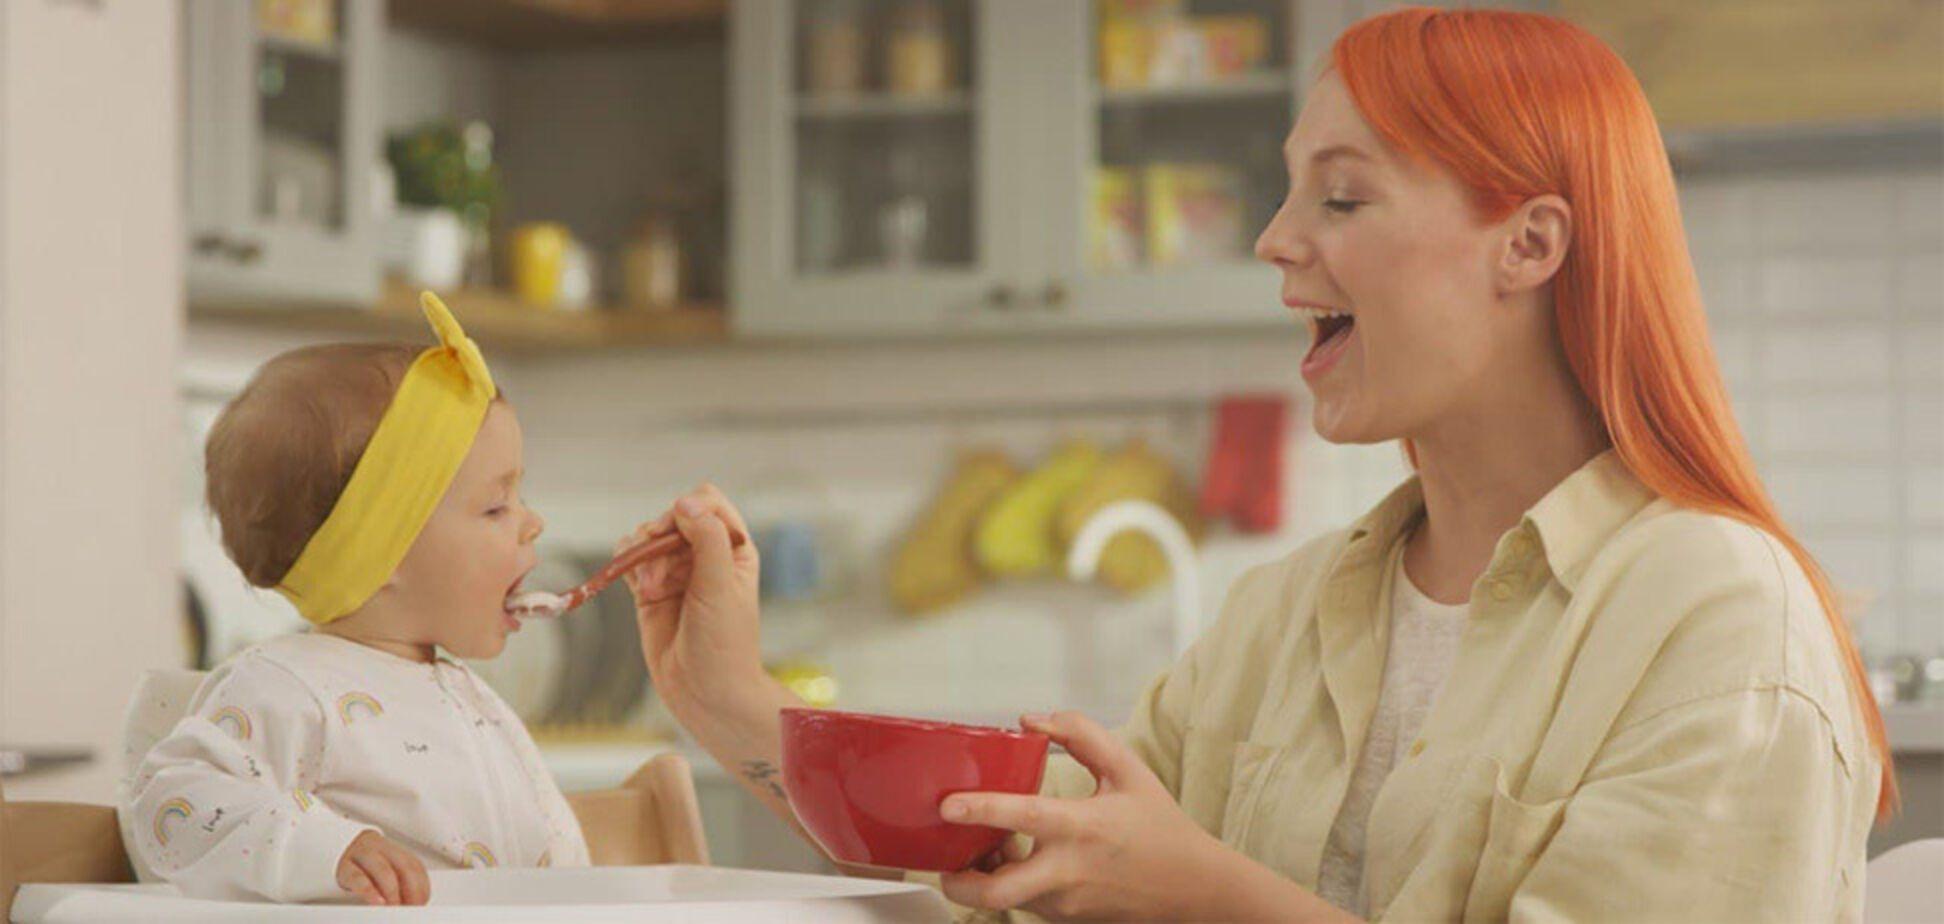 Донька Тарабарової стала обличчям бренду дитячого харчування. Фото